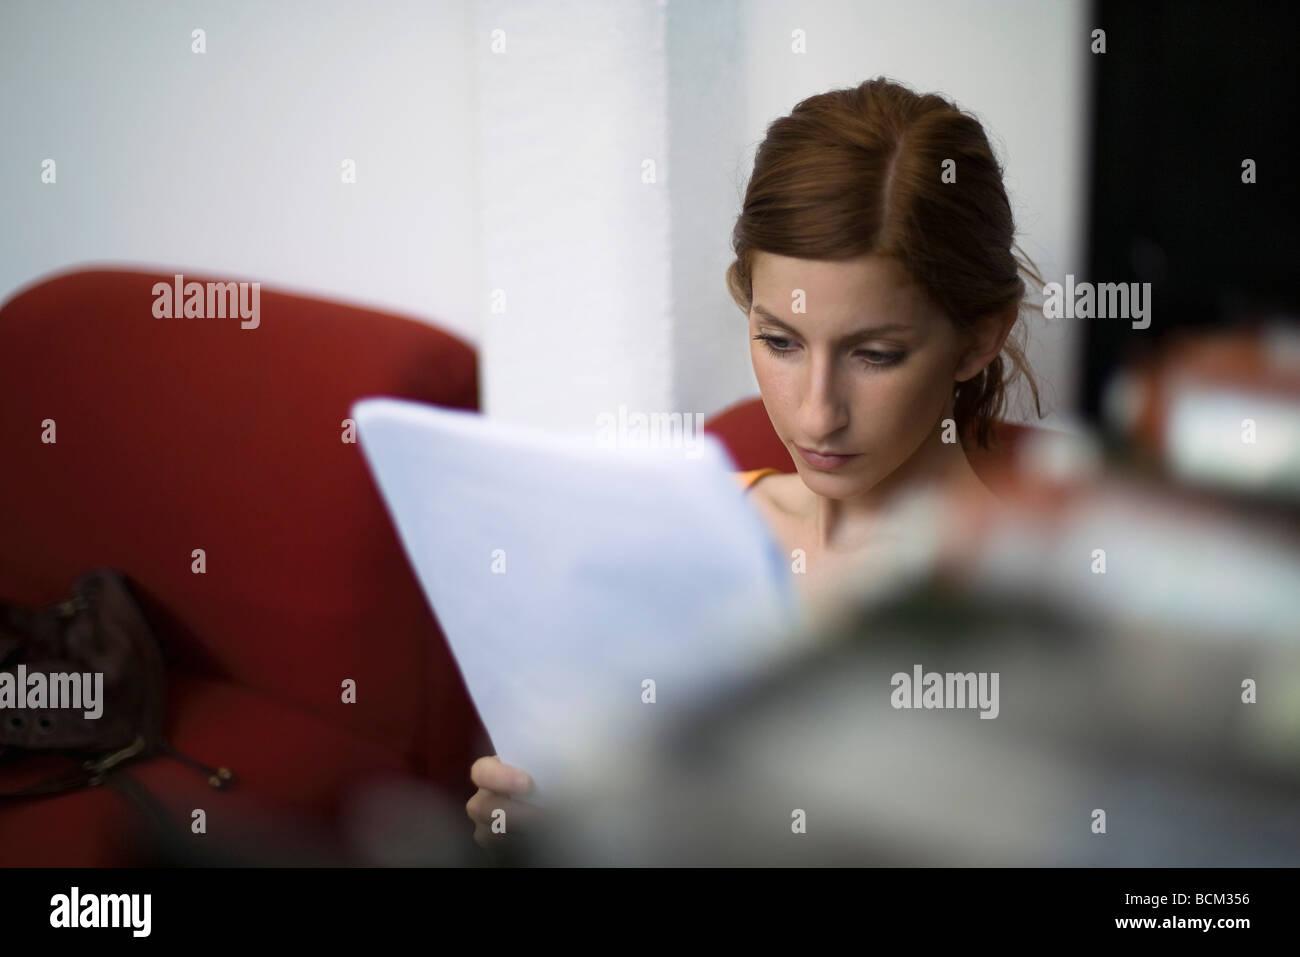 Mujer joven leer el documento Foto de stock